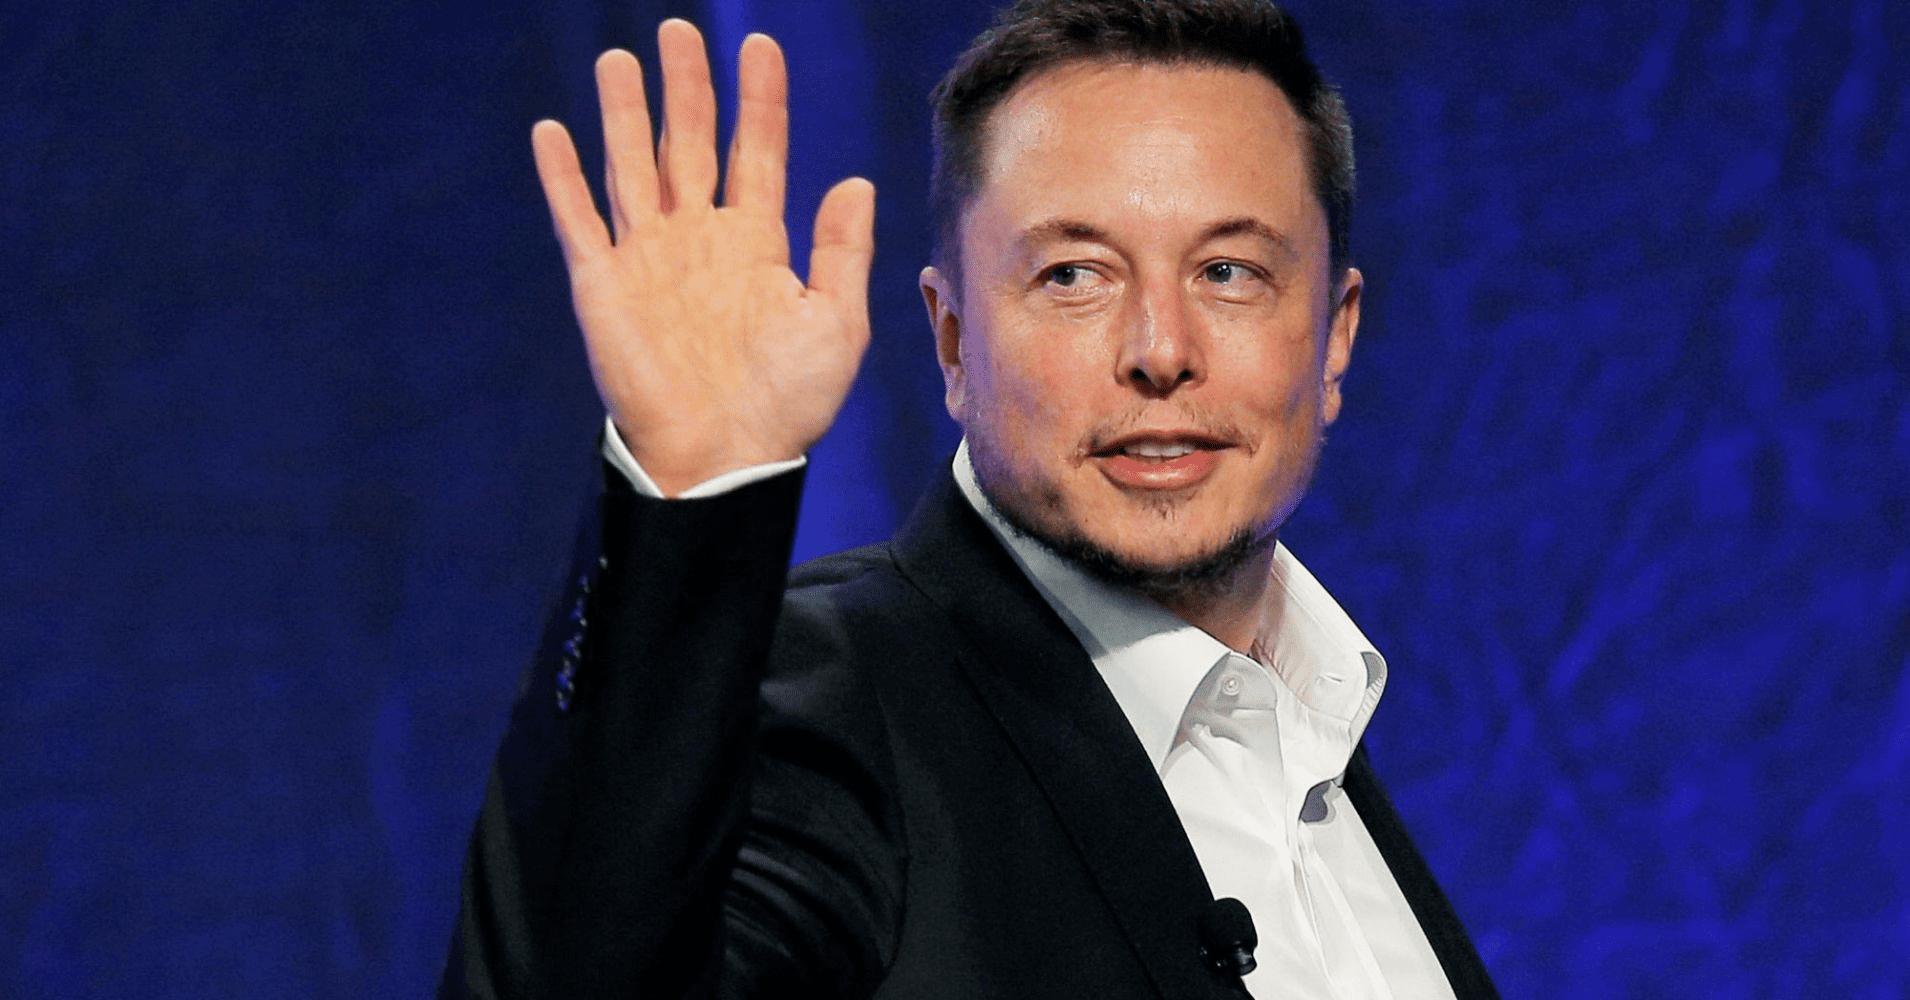 Илон Маск предсказал прорыв в технологиях батарей электромобилей